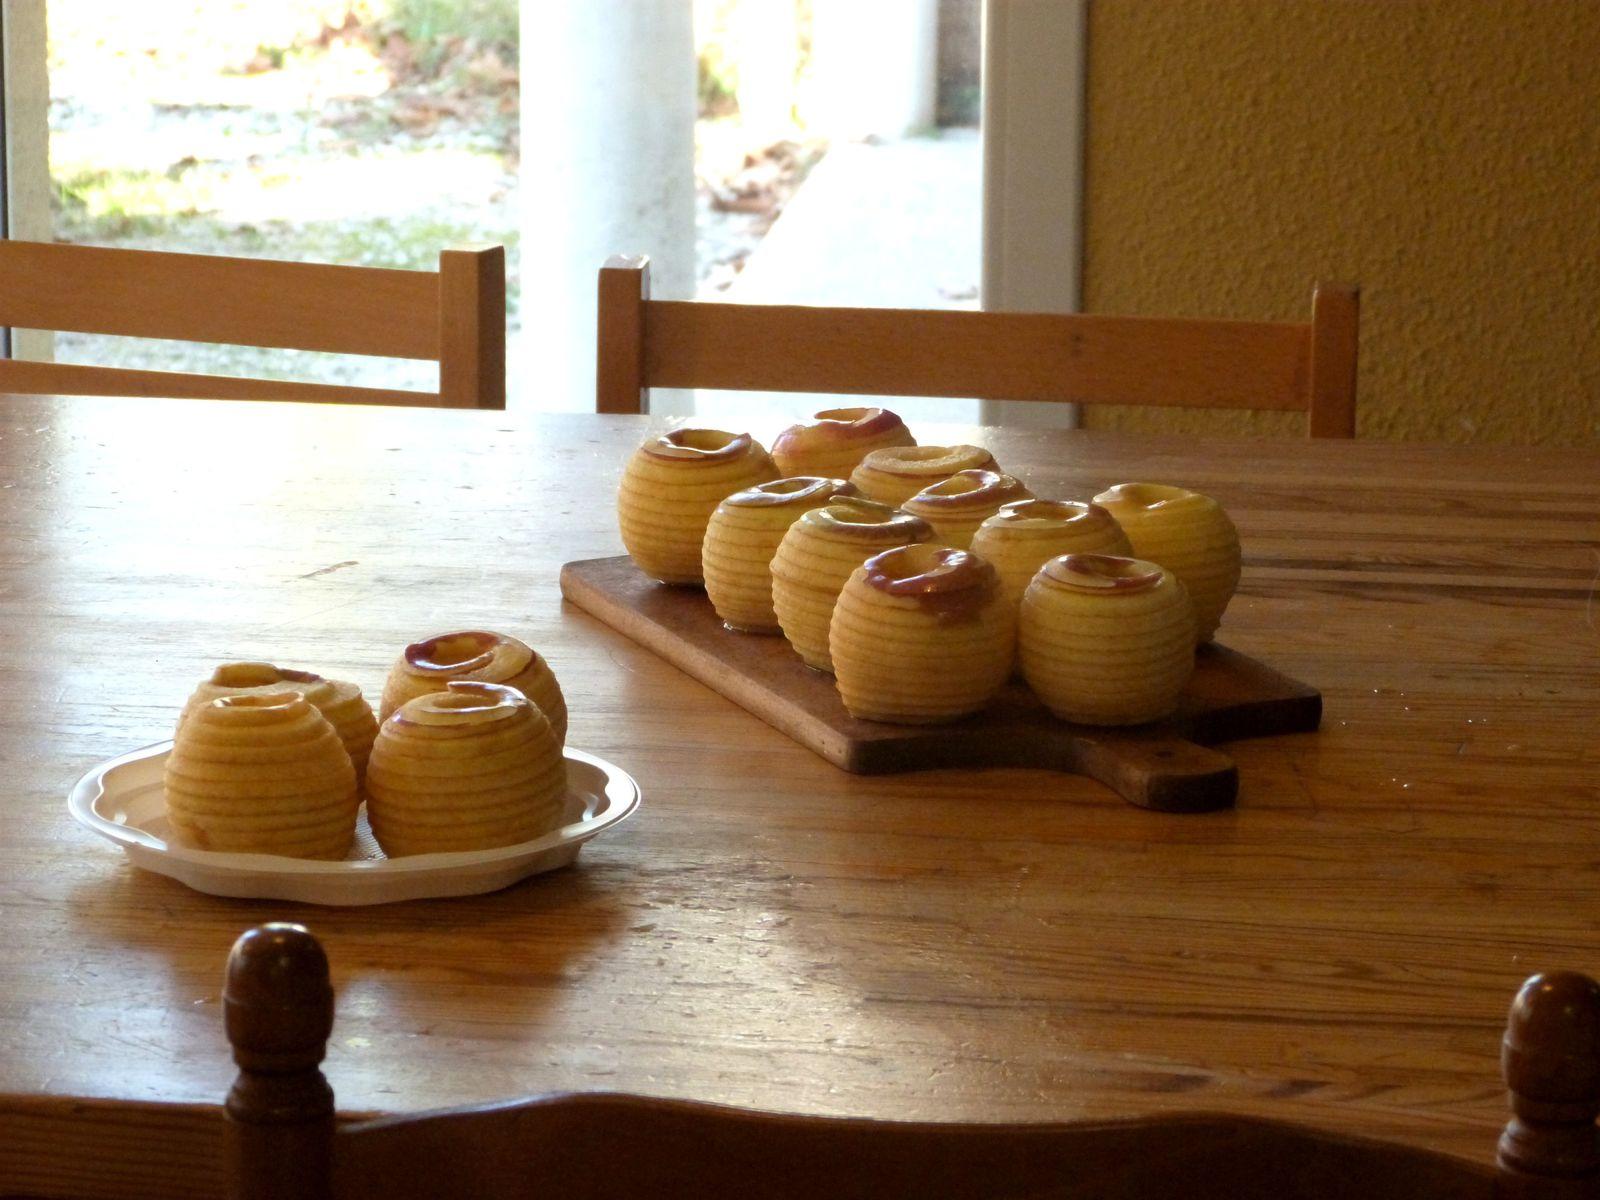 repas japonais en partenariat avec le restaurant Ckôko, octobre 2014